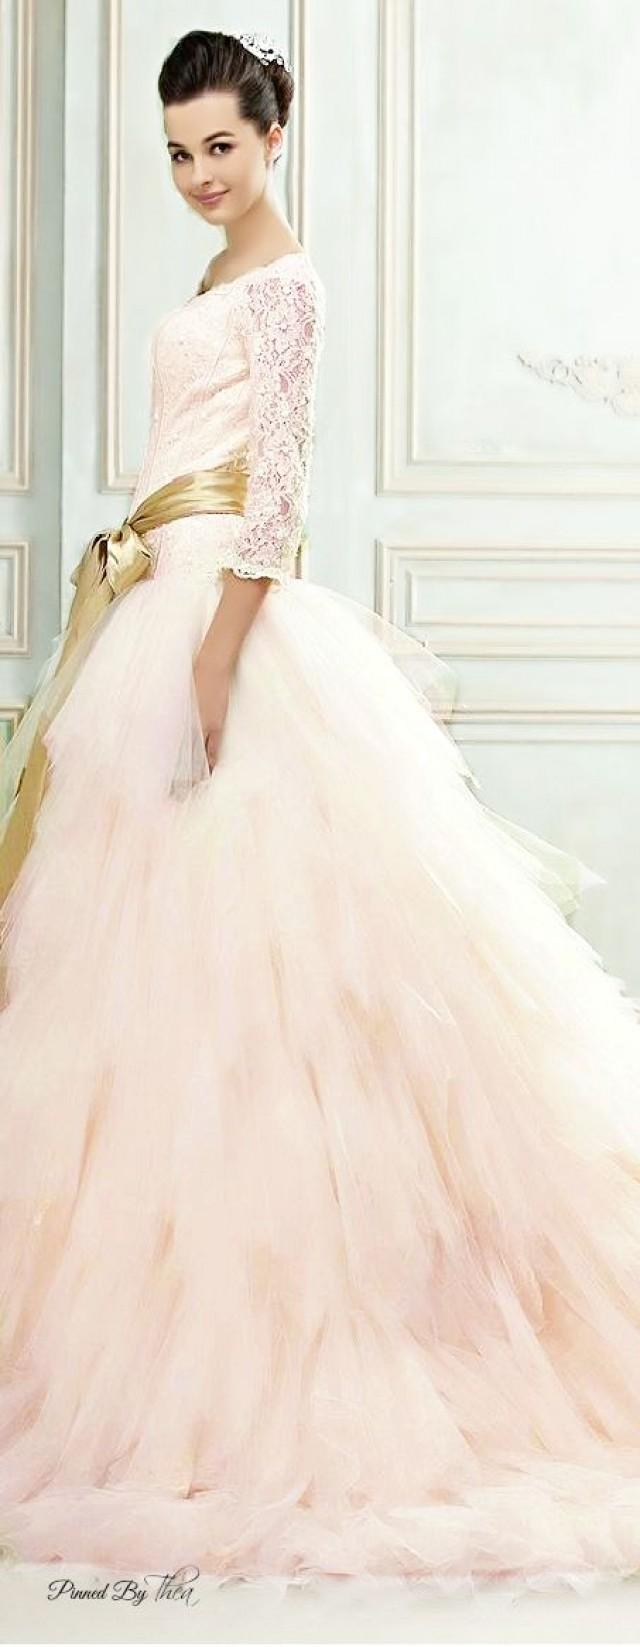 dress dress for your wedding day 2315875 weddbook